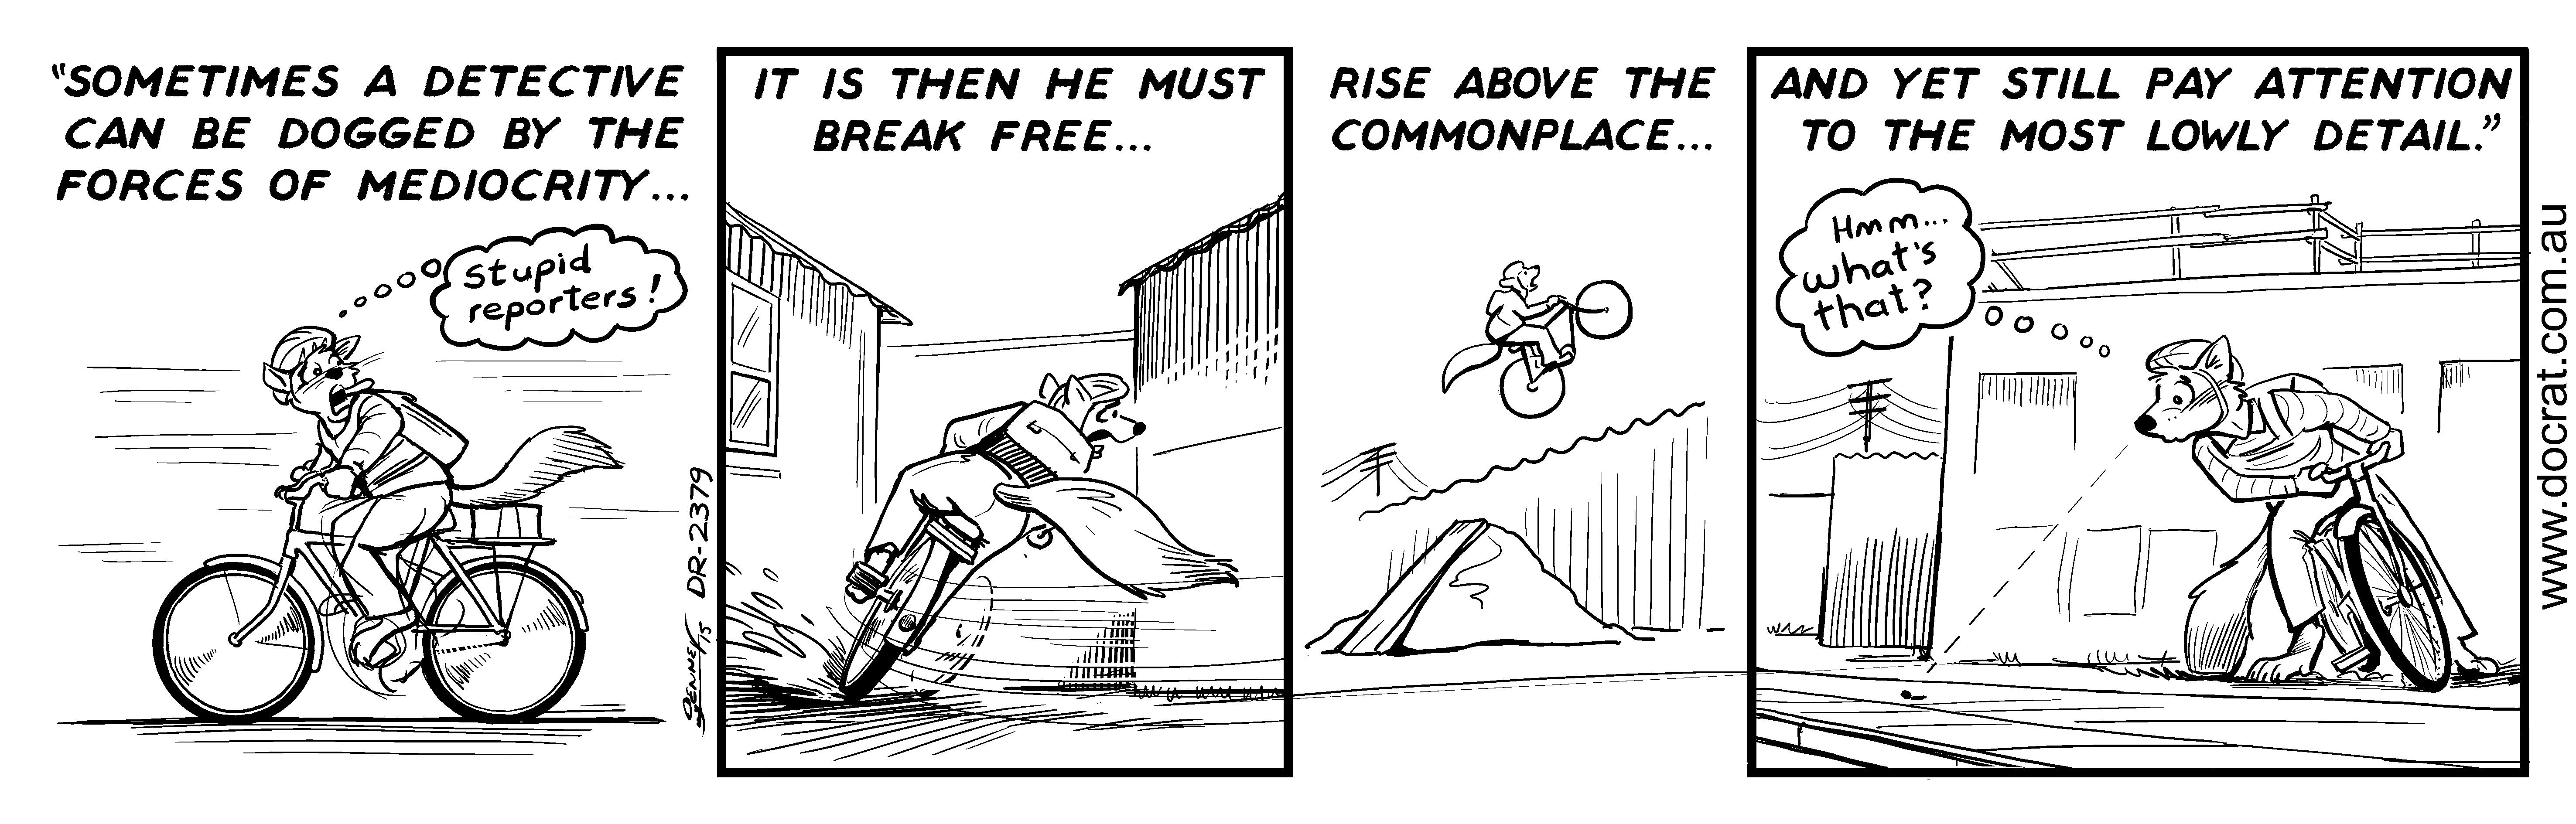 20151022